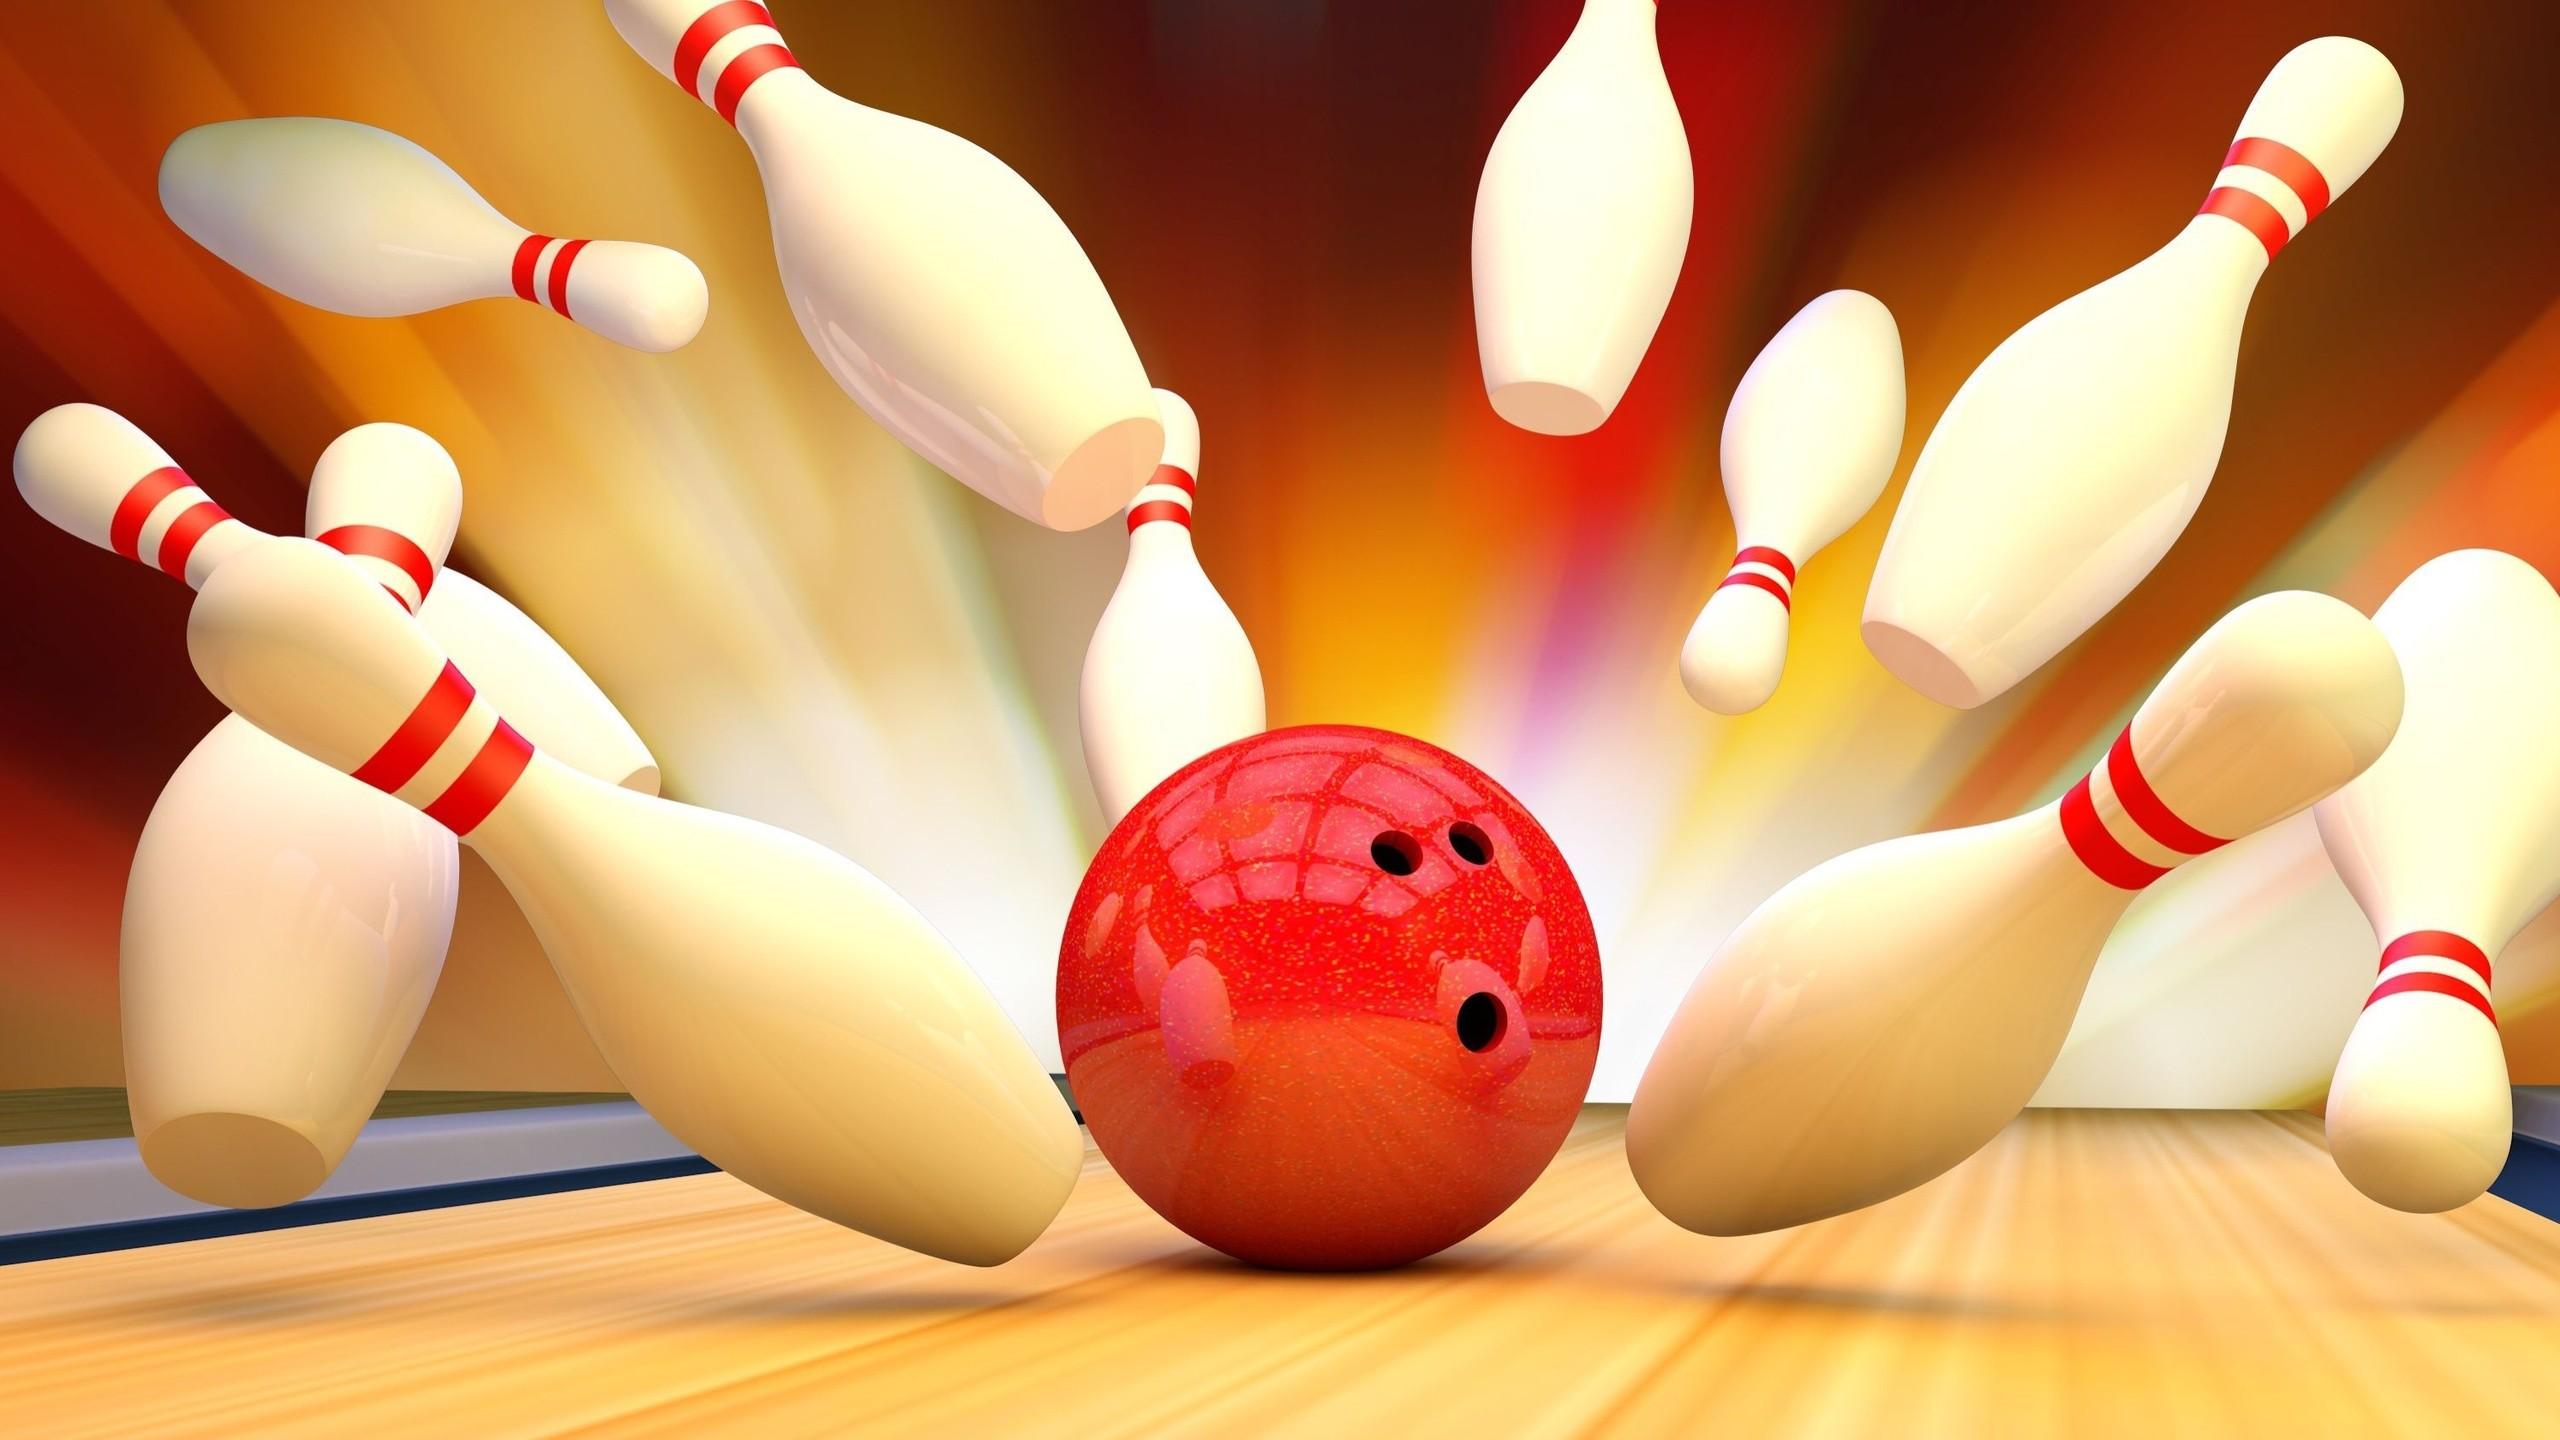 Res: 2560x1440, Bowling, Skittles, Bowling Art